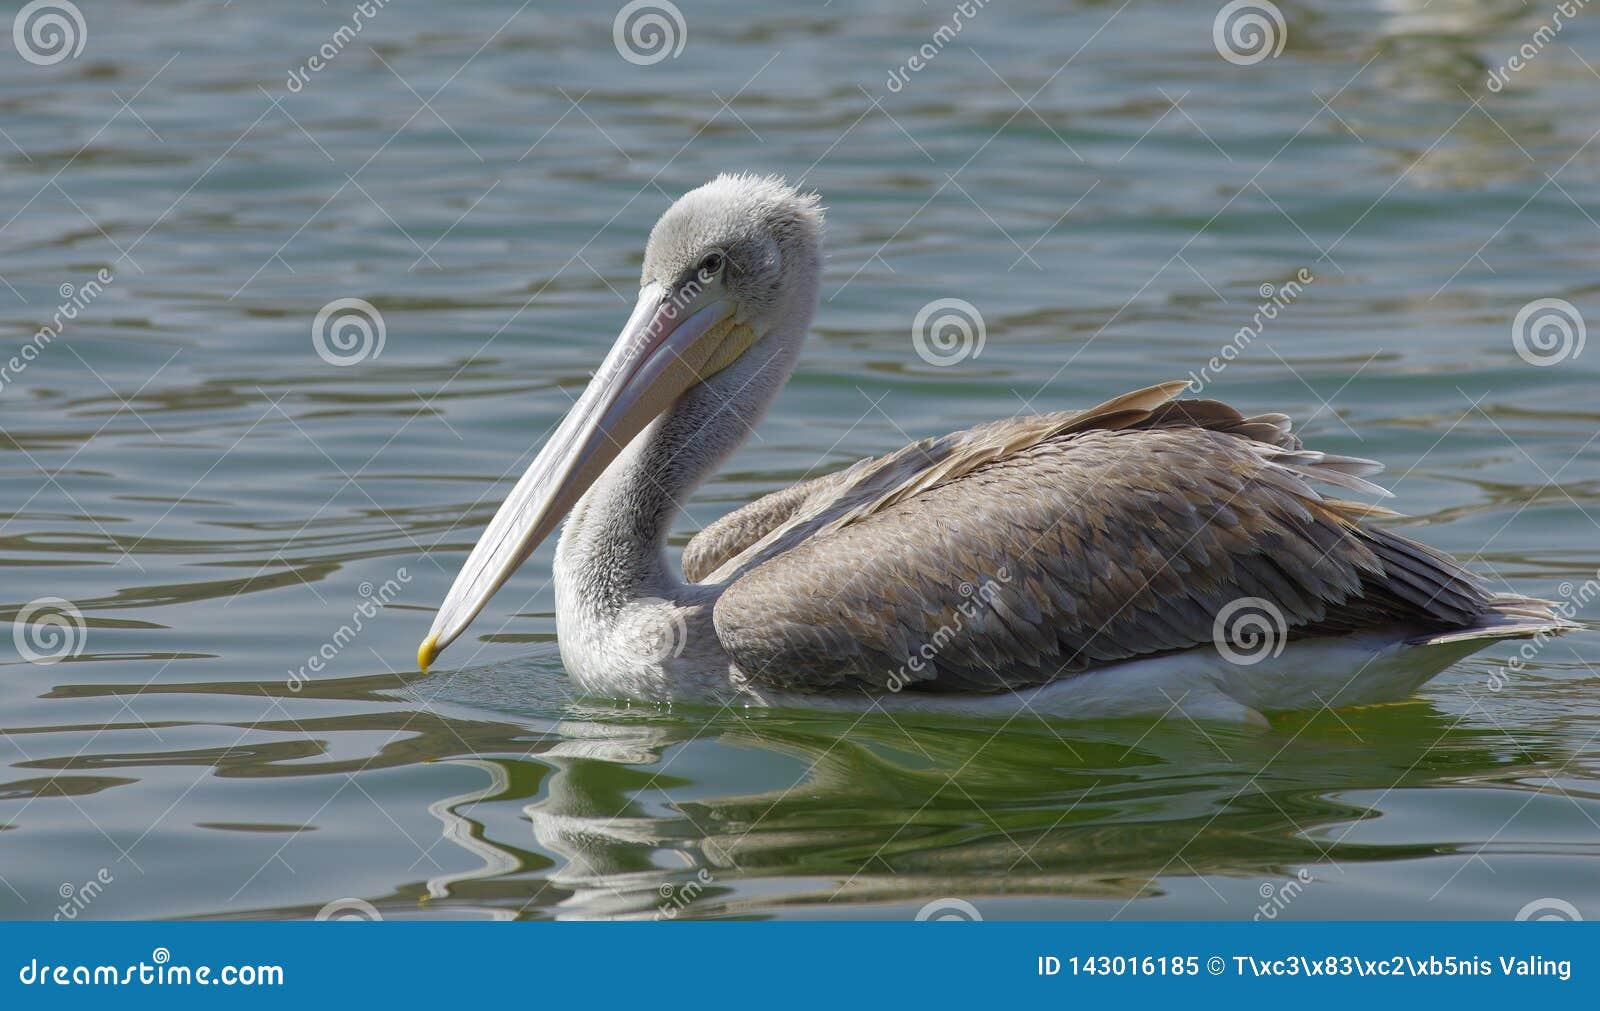 Pelicans catching fish near Lake Hora, Ethiopia